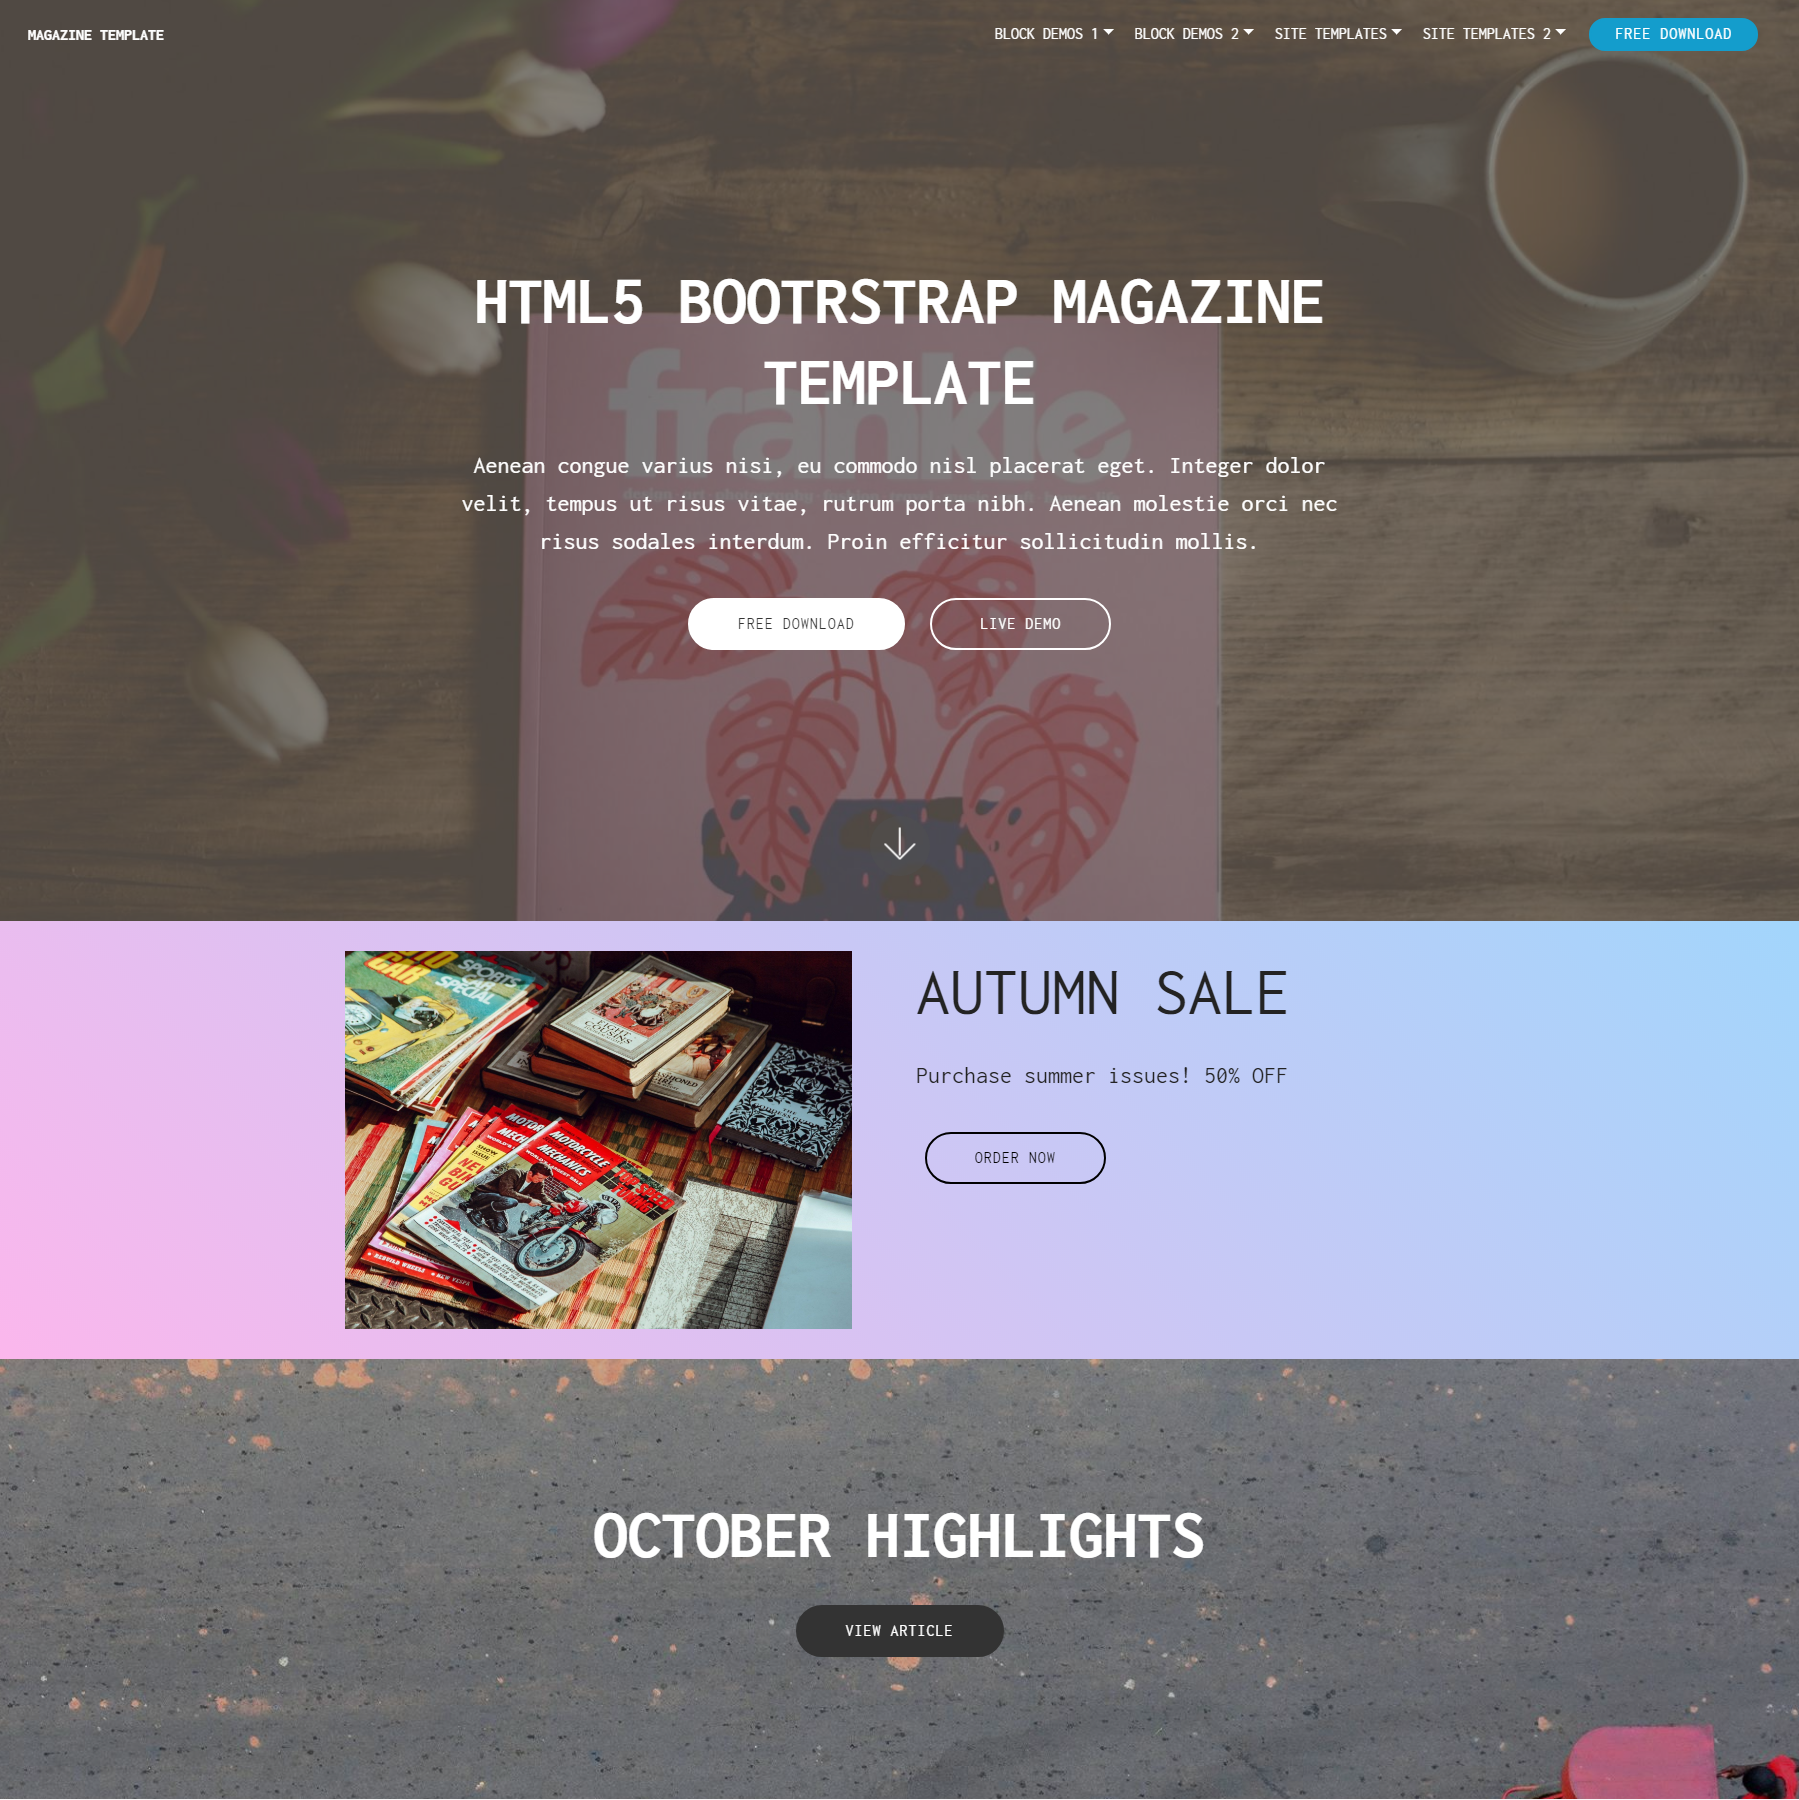 HTML5 Bootstrap Magazine Themes